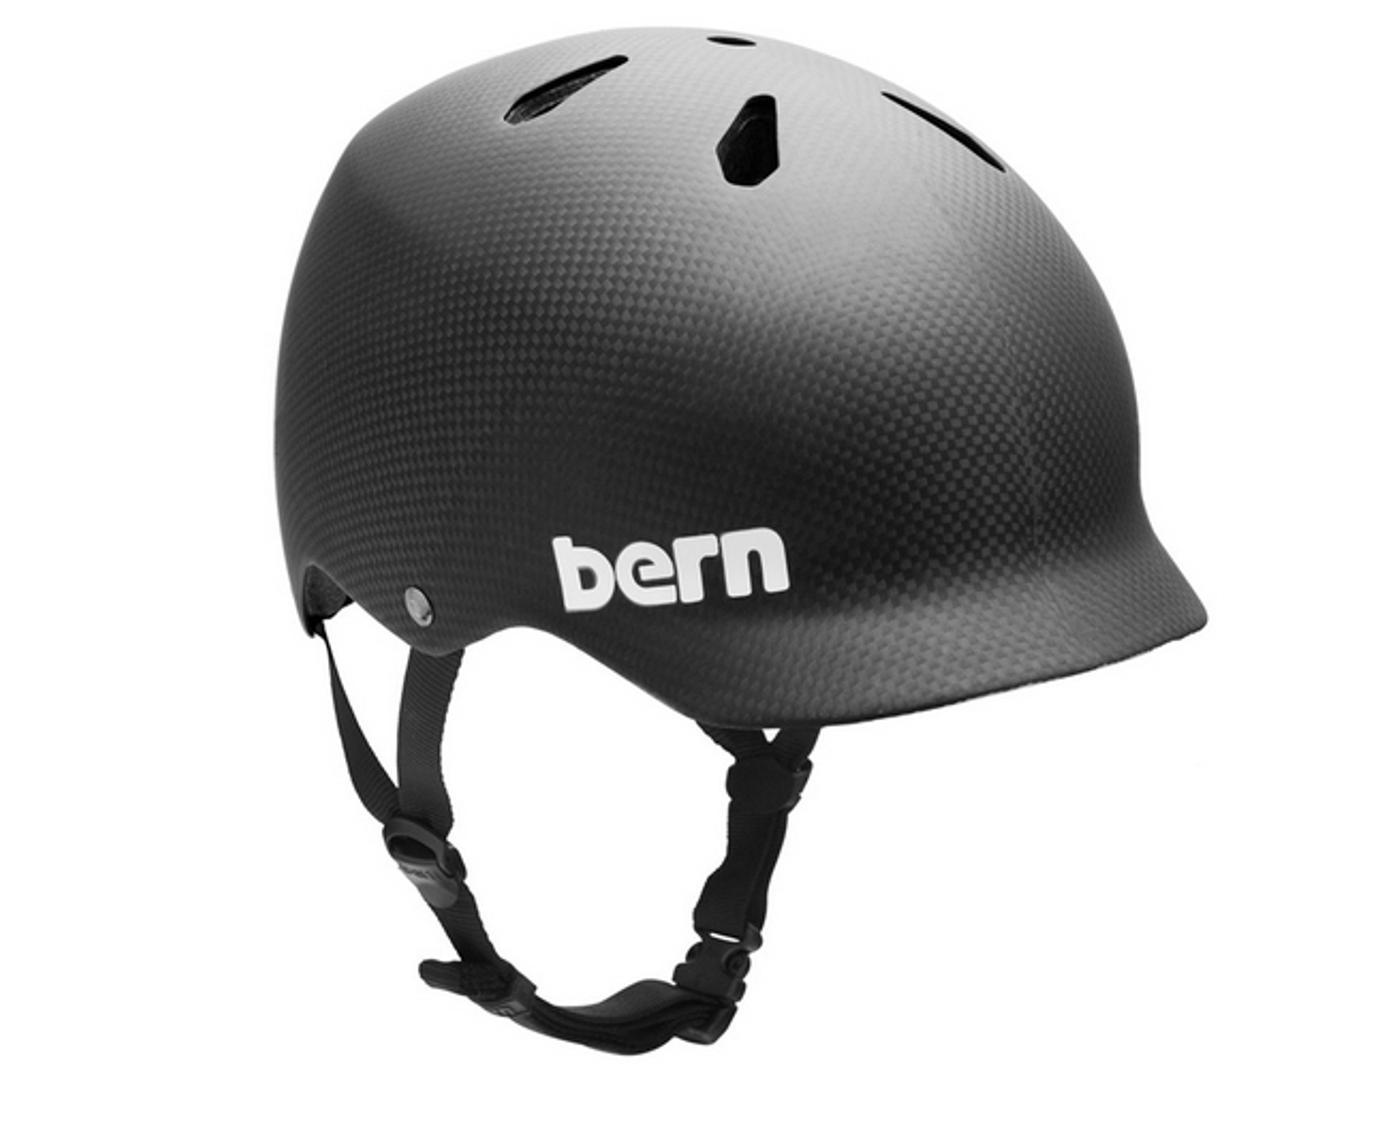 Bens Cycle: Win a Carbon Bern Helmet